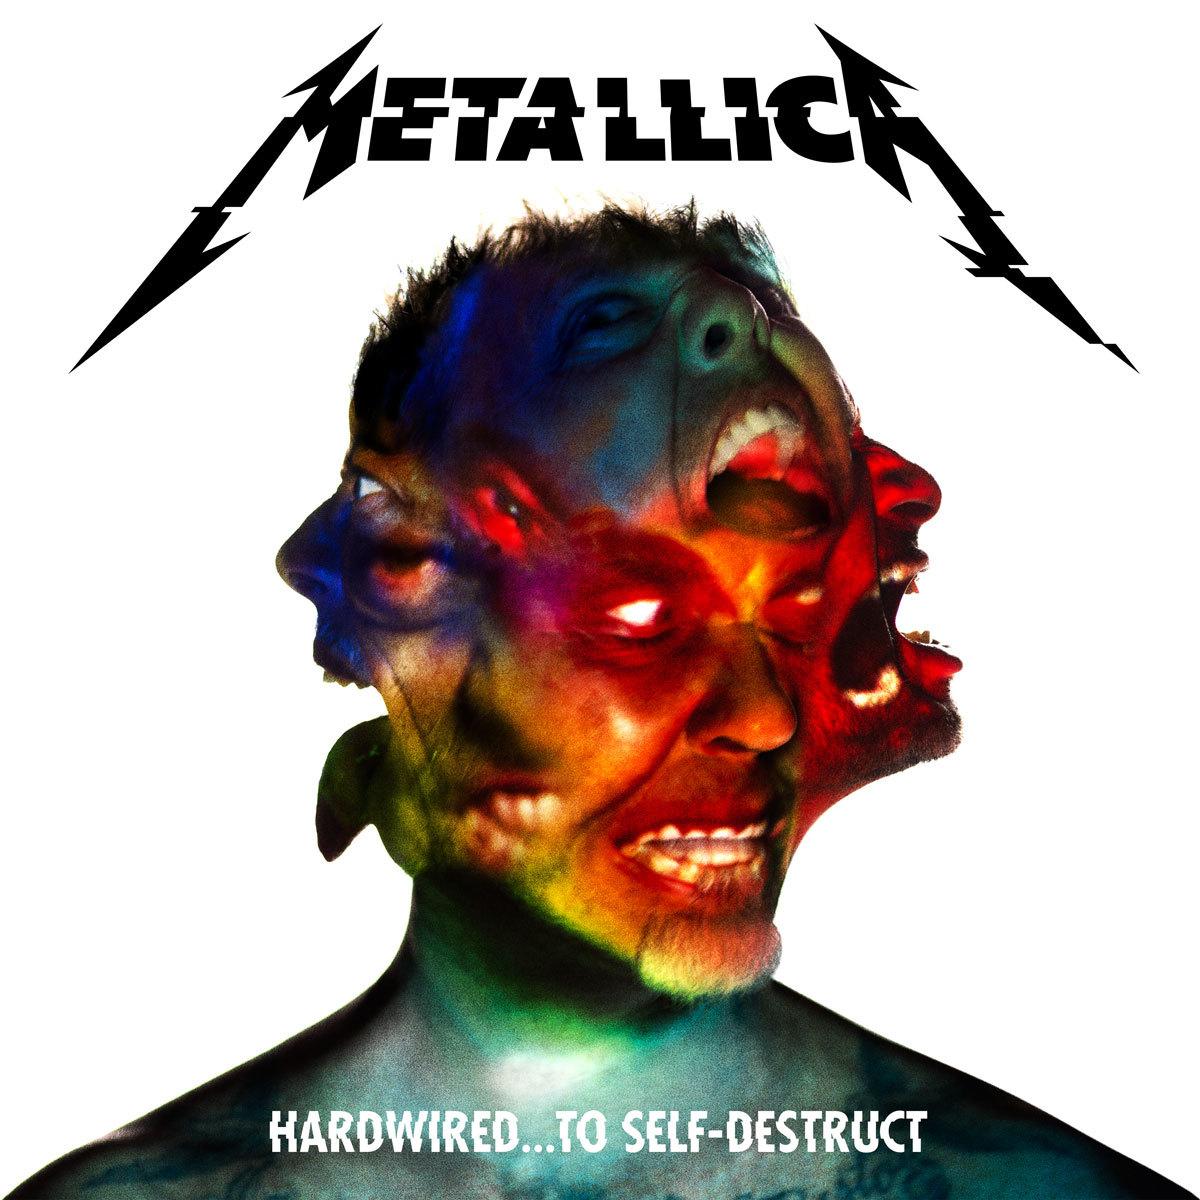 #5 Metallica - Hardwired...To Self-Destruct